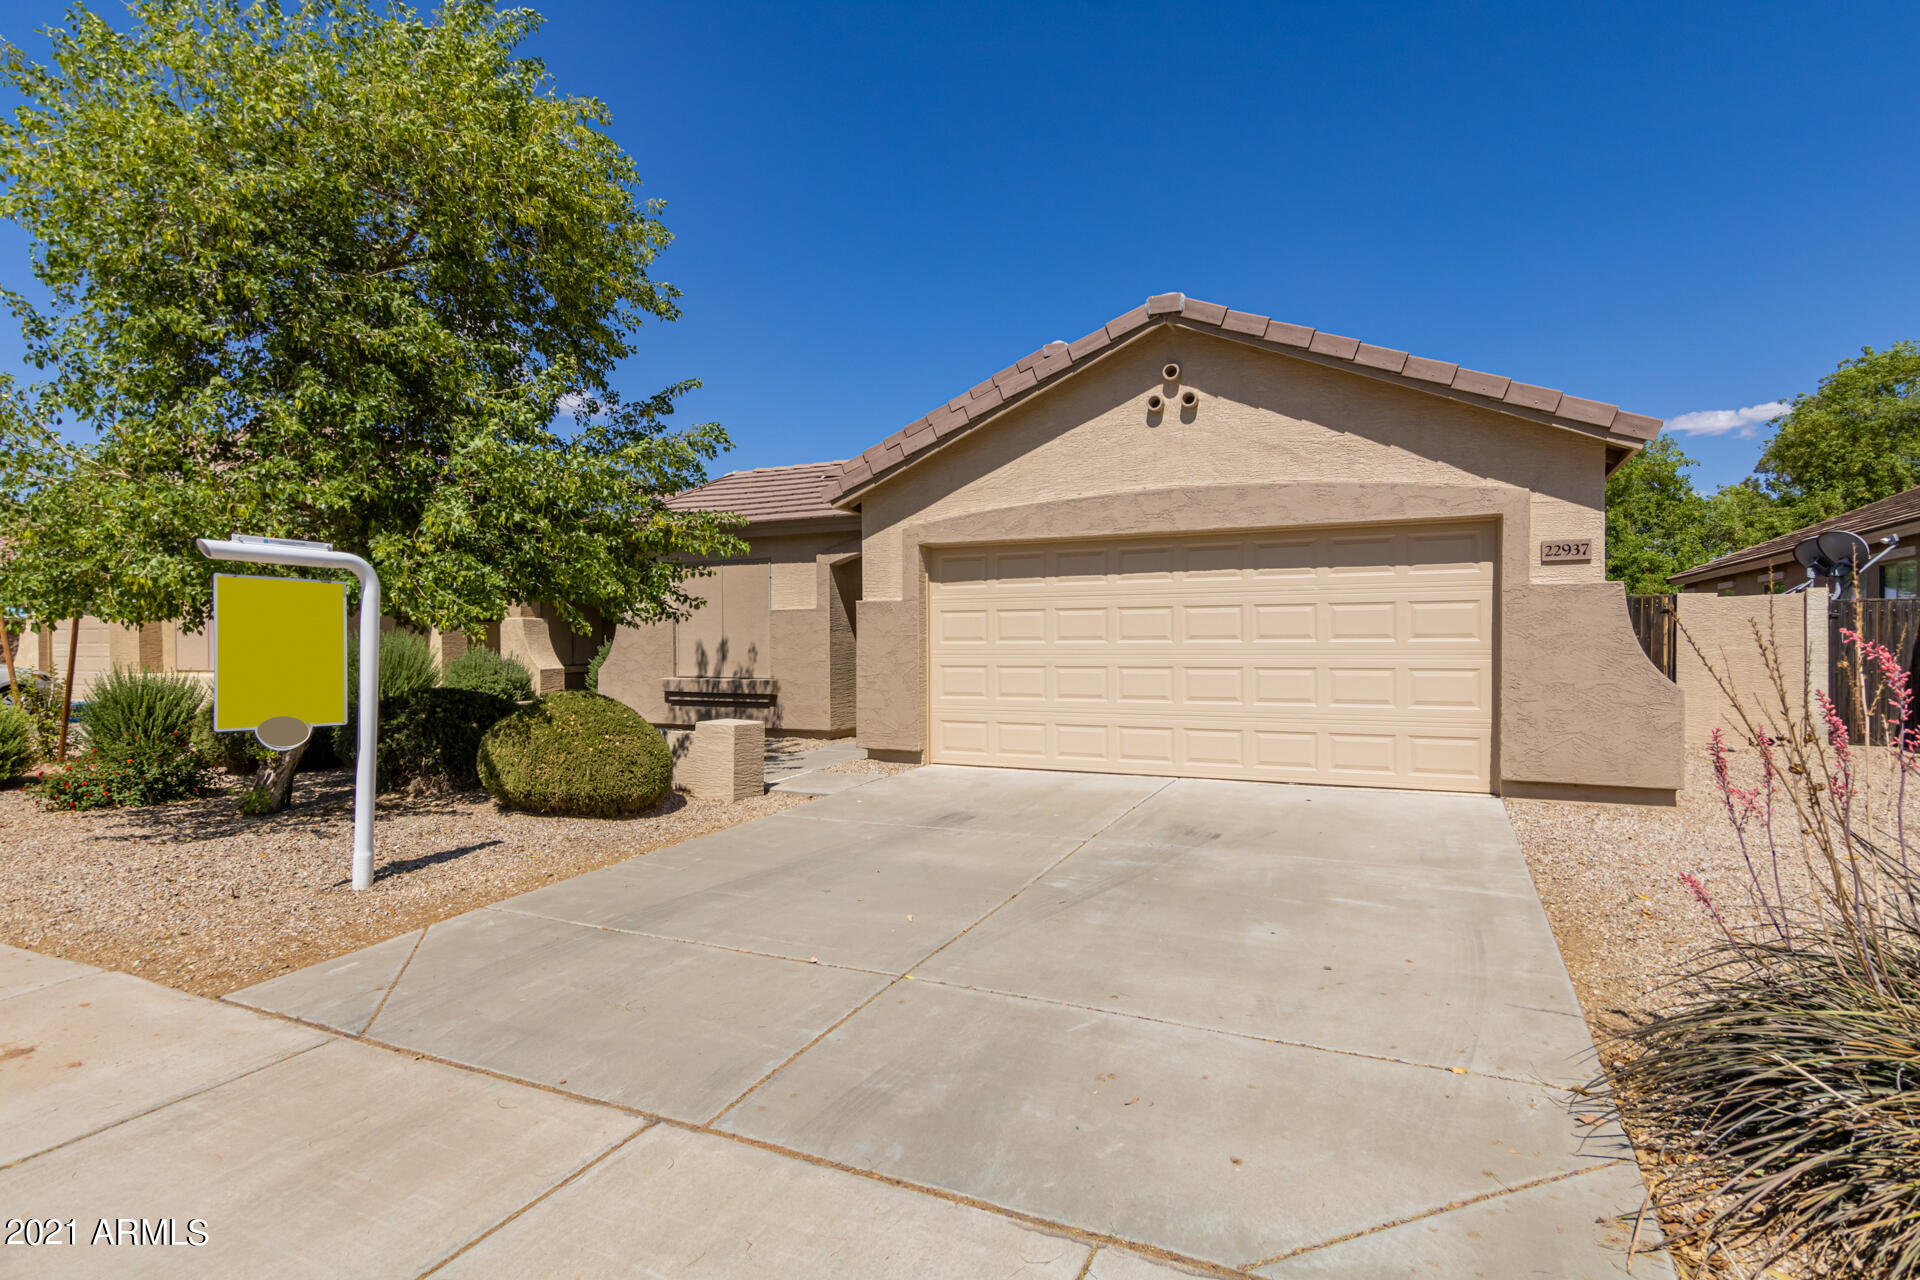 22937 215TH Street, Queen Creek, Arizona 85142, 3 Bedrooms Bedrooms, ,2 BathroomsBathrooms,Residential,For Sale,215TH,6237529